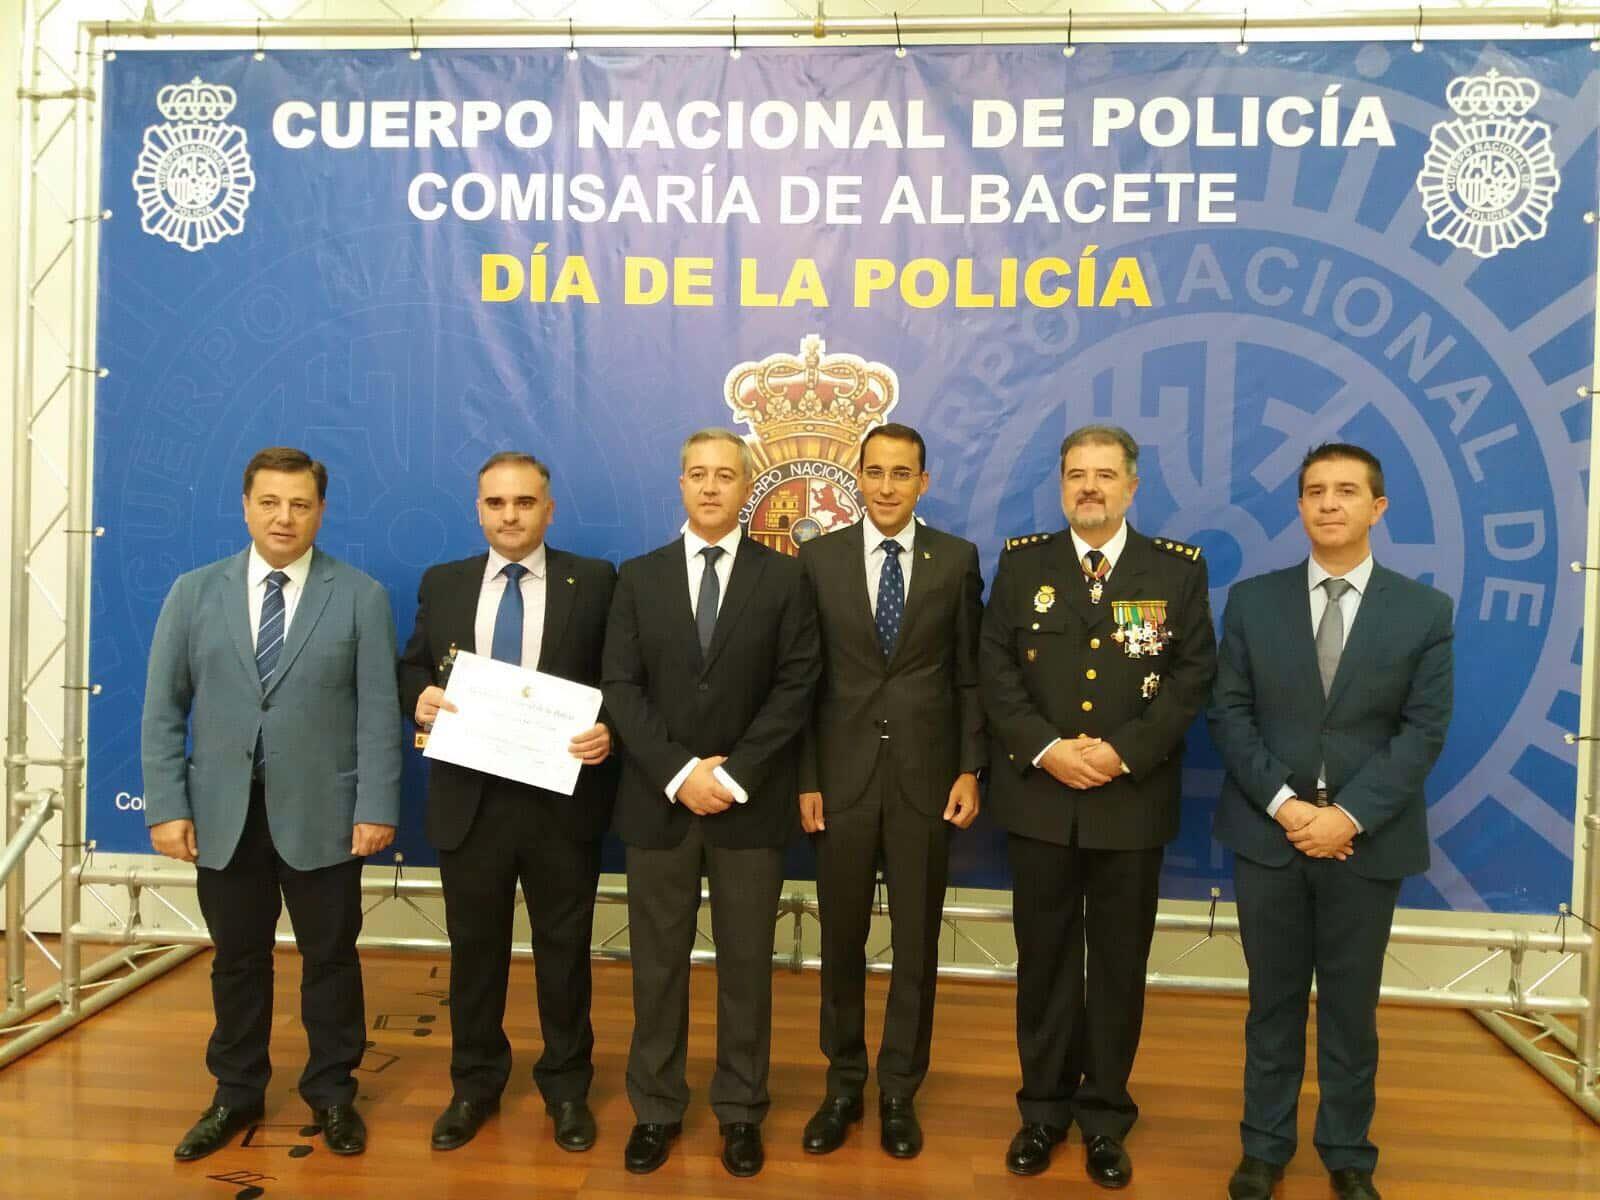 https://blog.globalcaja.es/wp-content/uploads/2017/10/policia-nacional.jpg